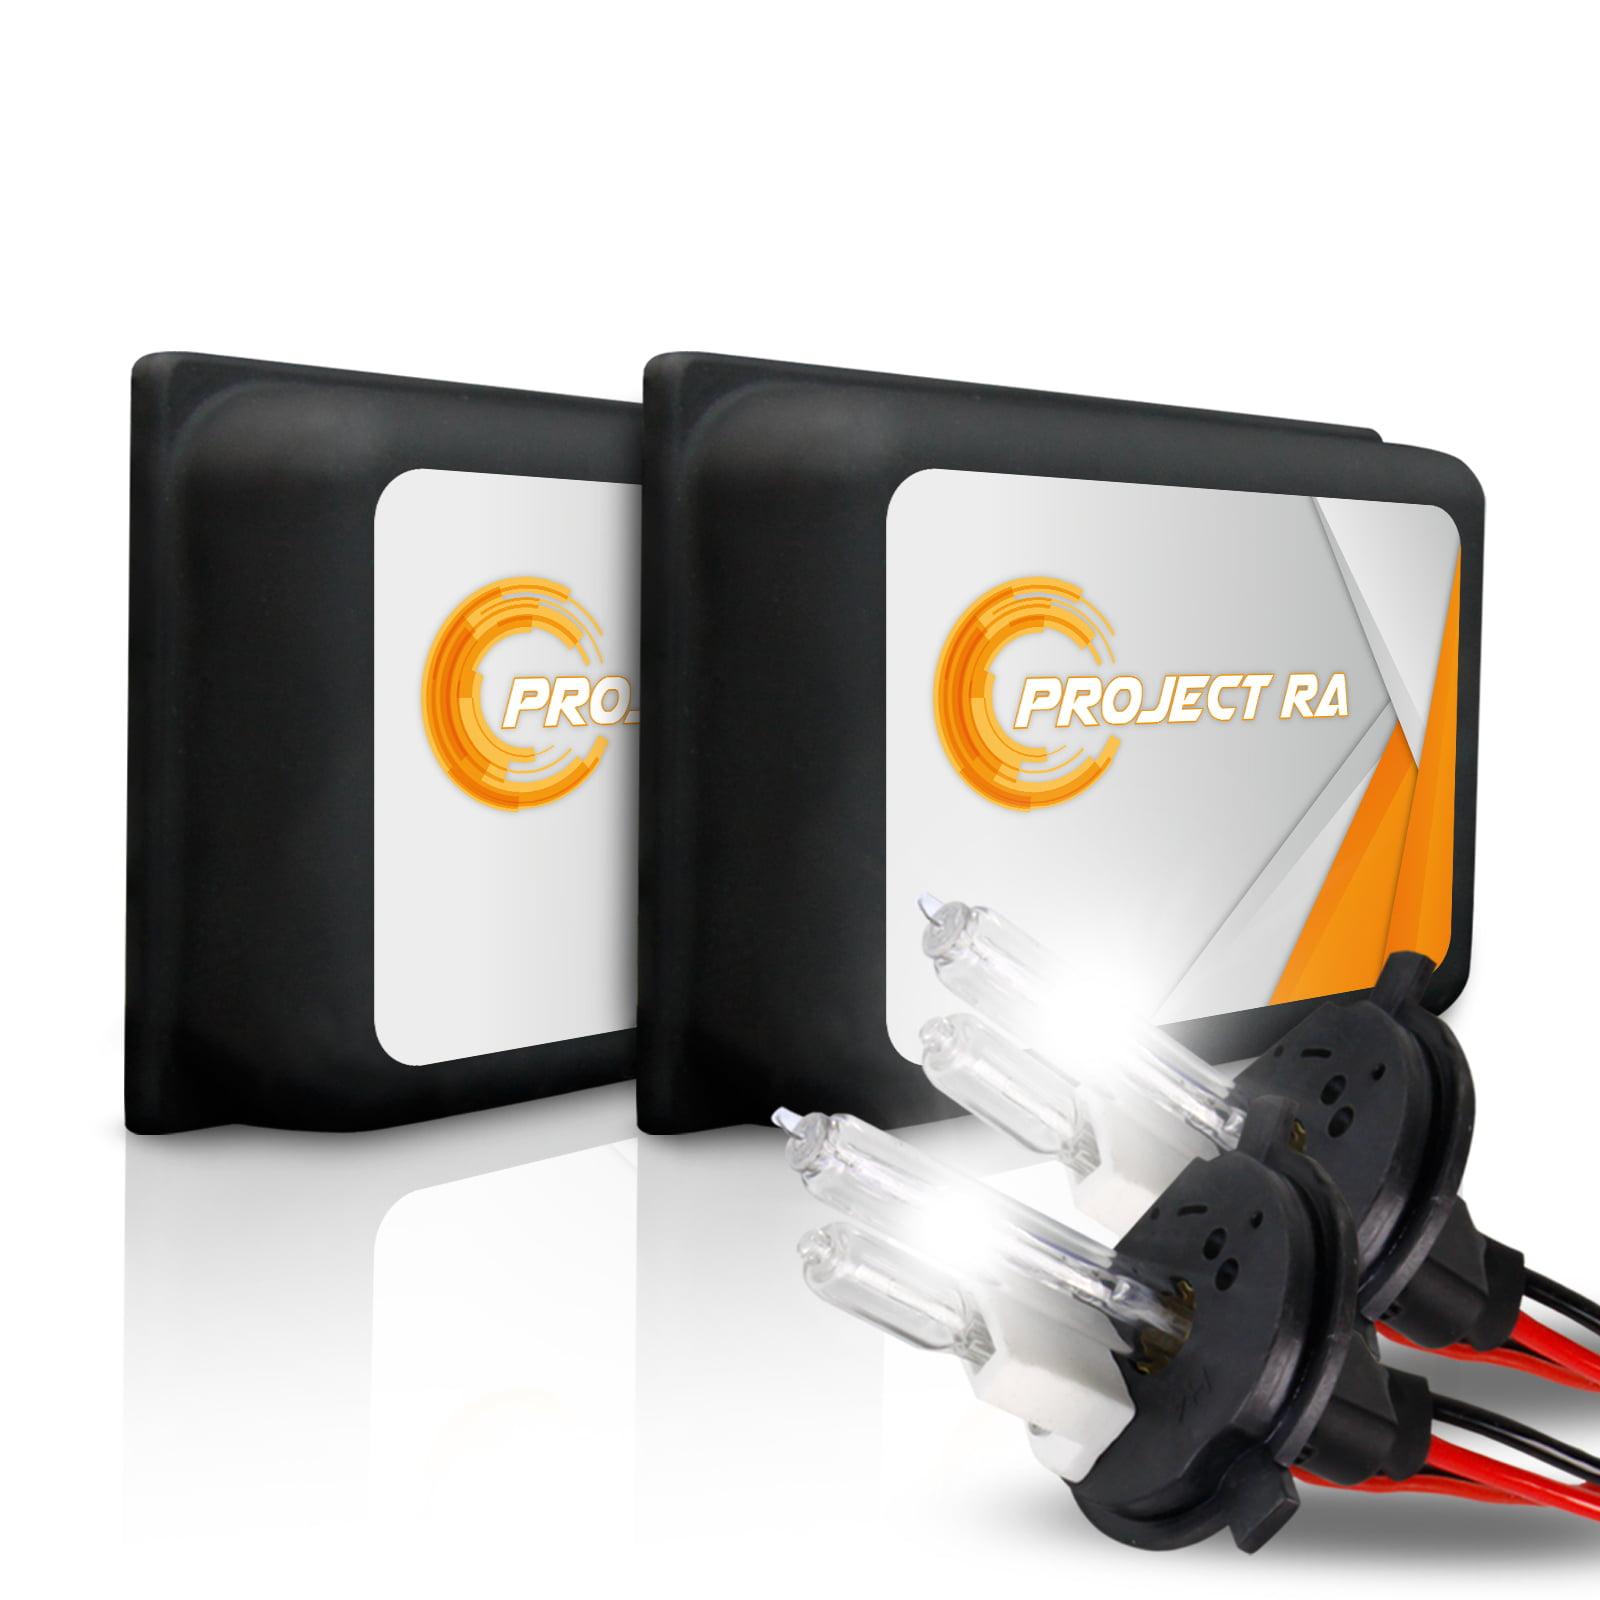 P.RA HID 55W MICRO Slim Xenon Kit - 9004 9005 9006 9007 H1 H3 H4 H7 H10 H11 H13